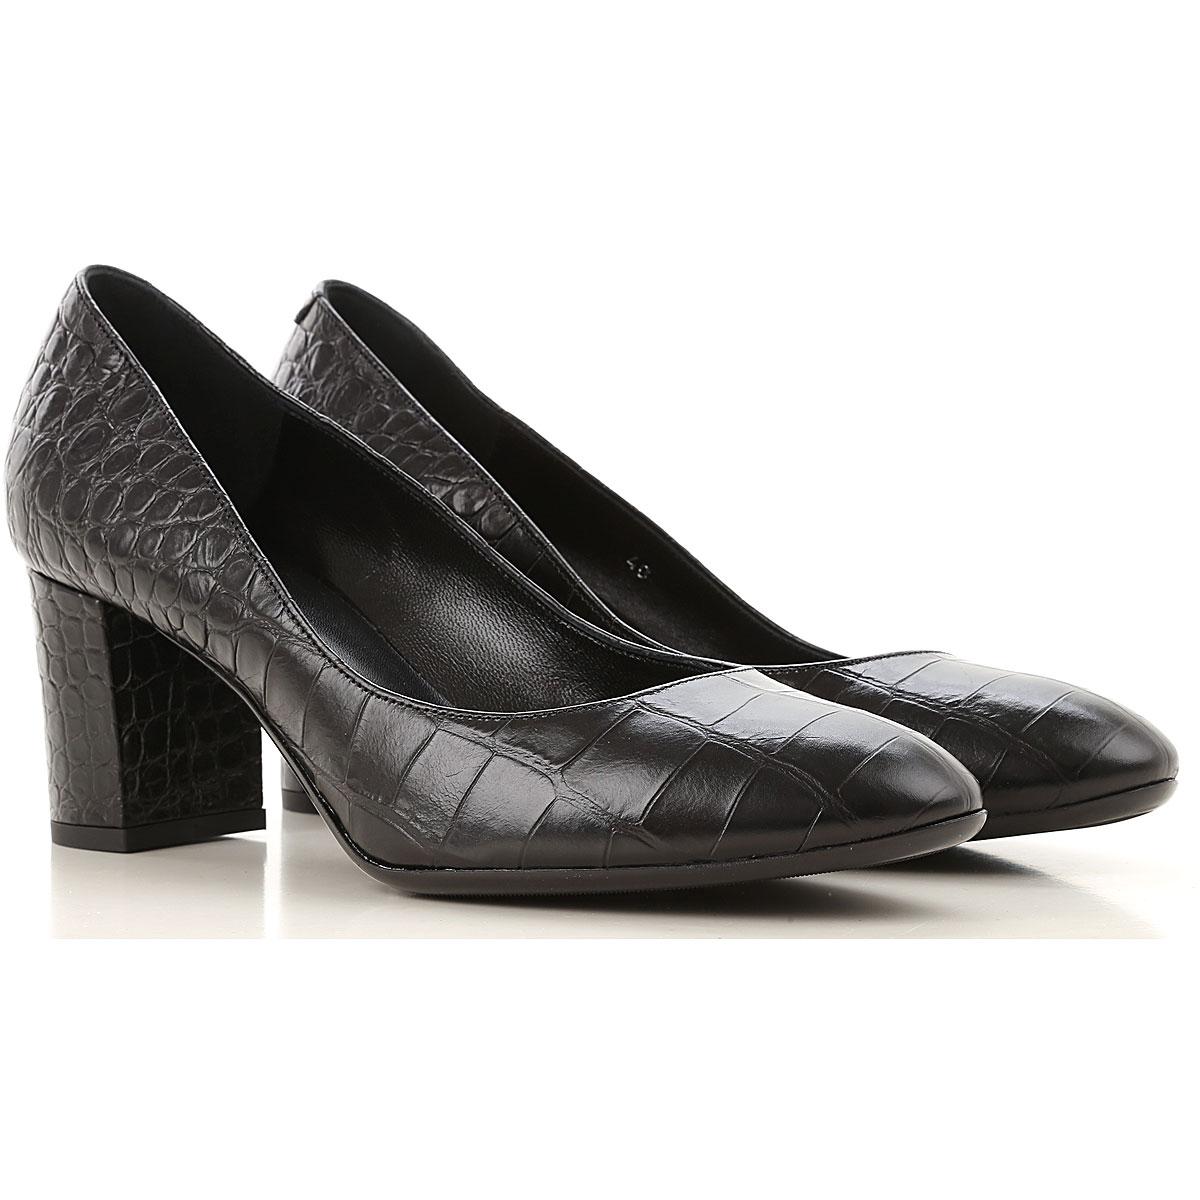 Guglielmo Rotta Pumps & High Heels for Women On Sale, Black, Leather, 2019, 10 6 7 8